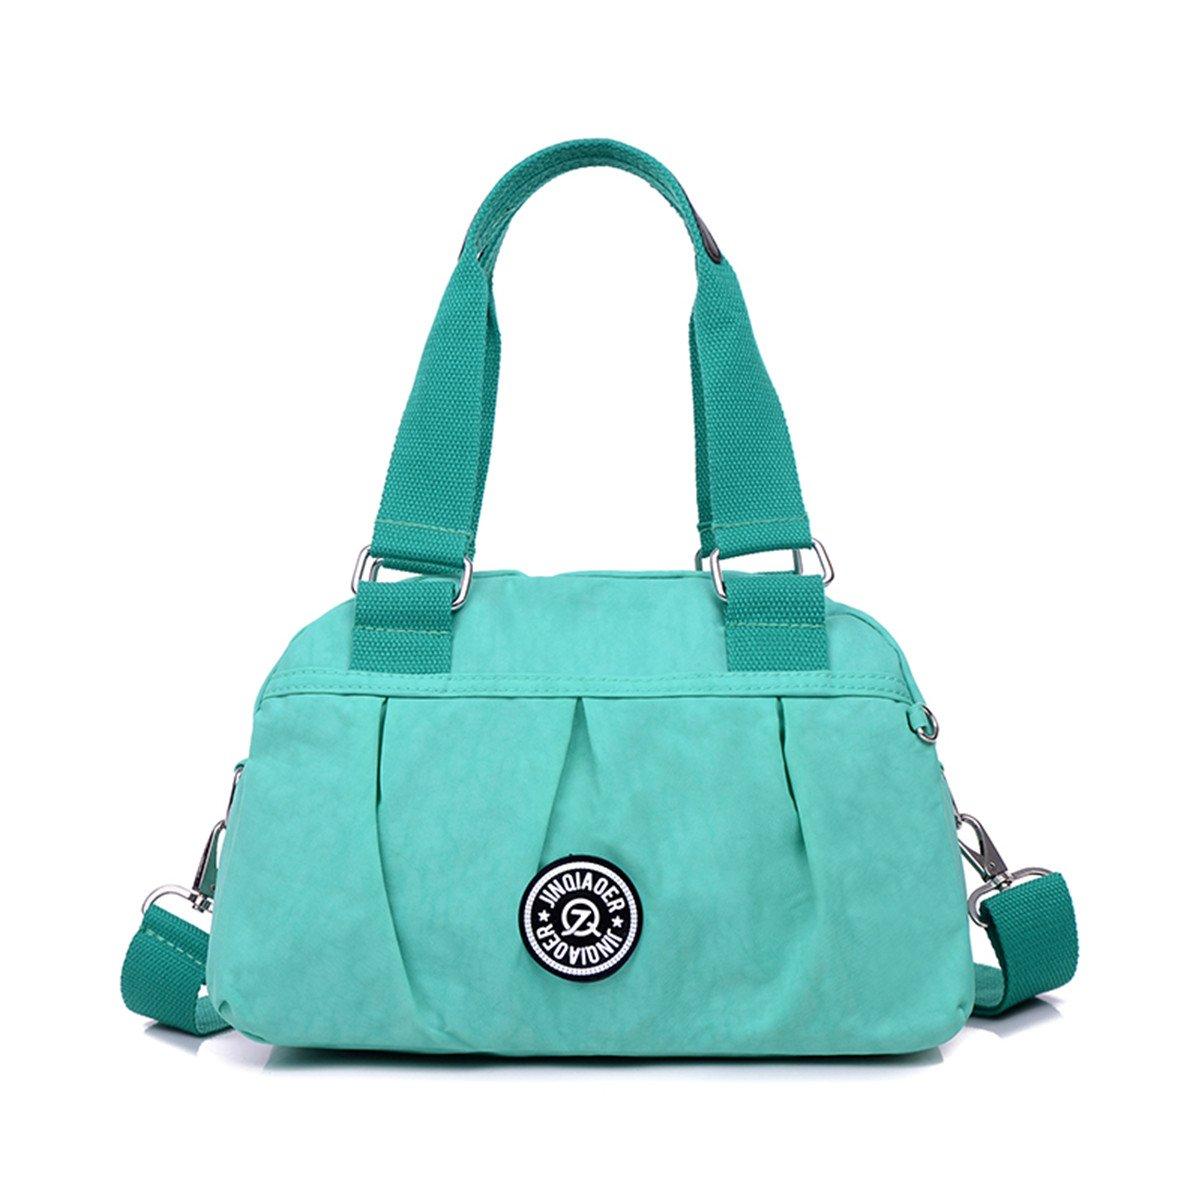 Tiny Chou Pure Color Water Resistant Nylon Satchel Handbag Lightweight Crossbody Messenger Bag